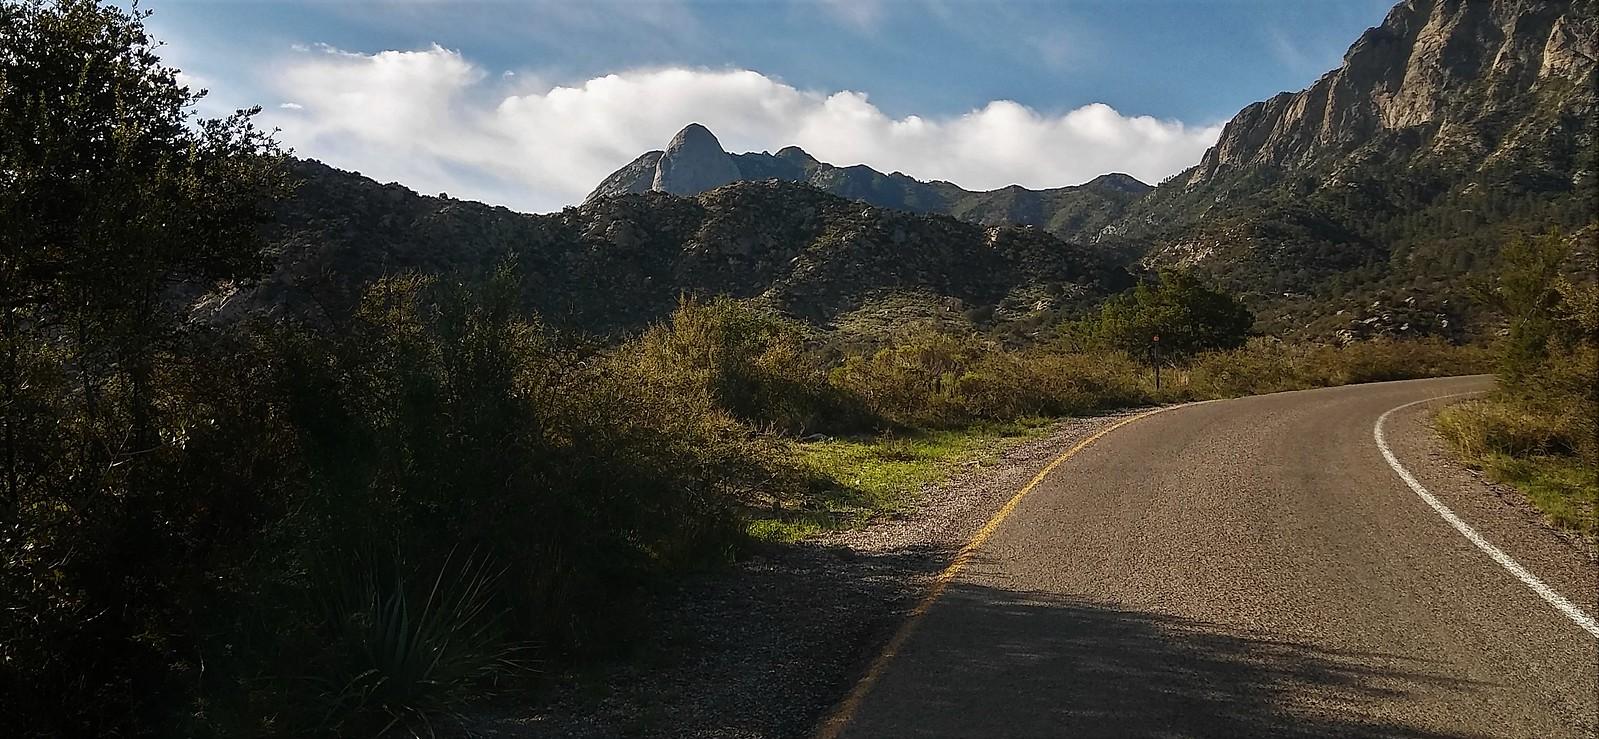 Aguirre Springs, Organ Mountains, NM